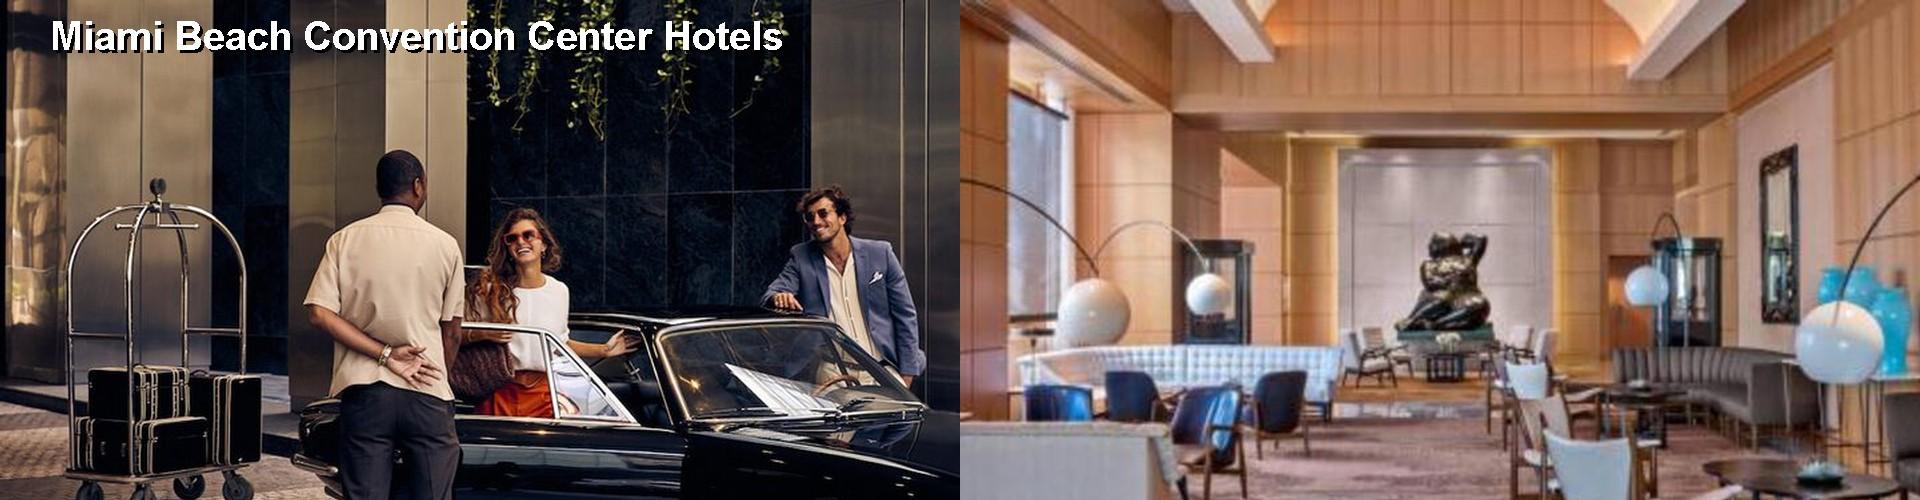 5 Best Hotels Near Miami Beach Convention Center